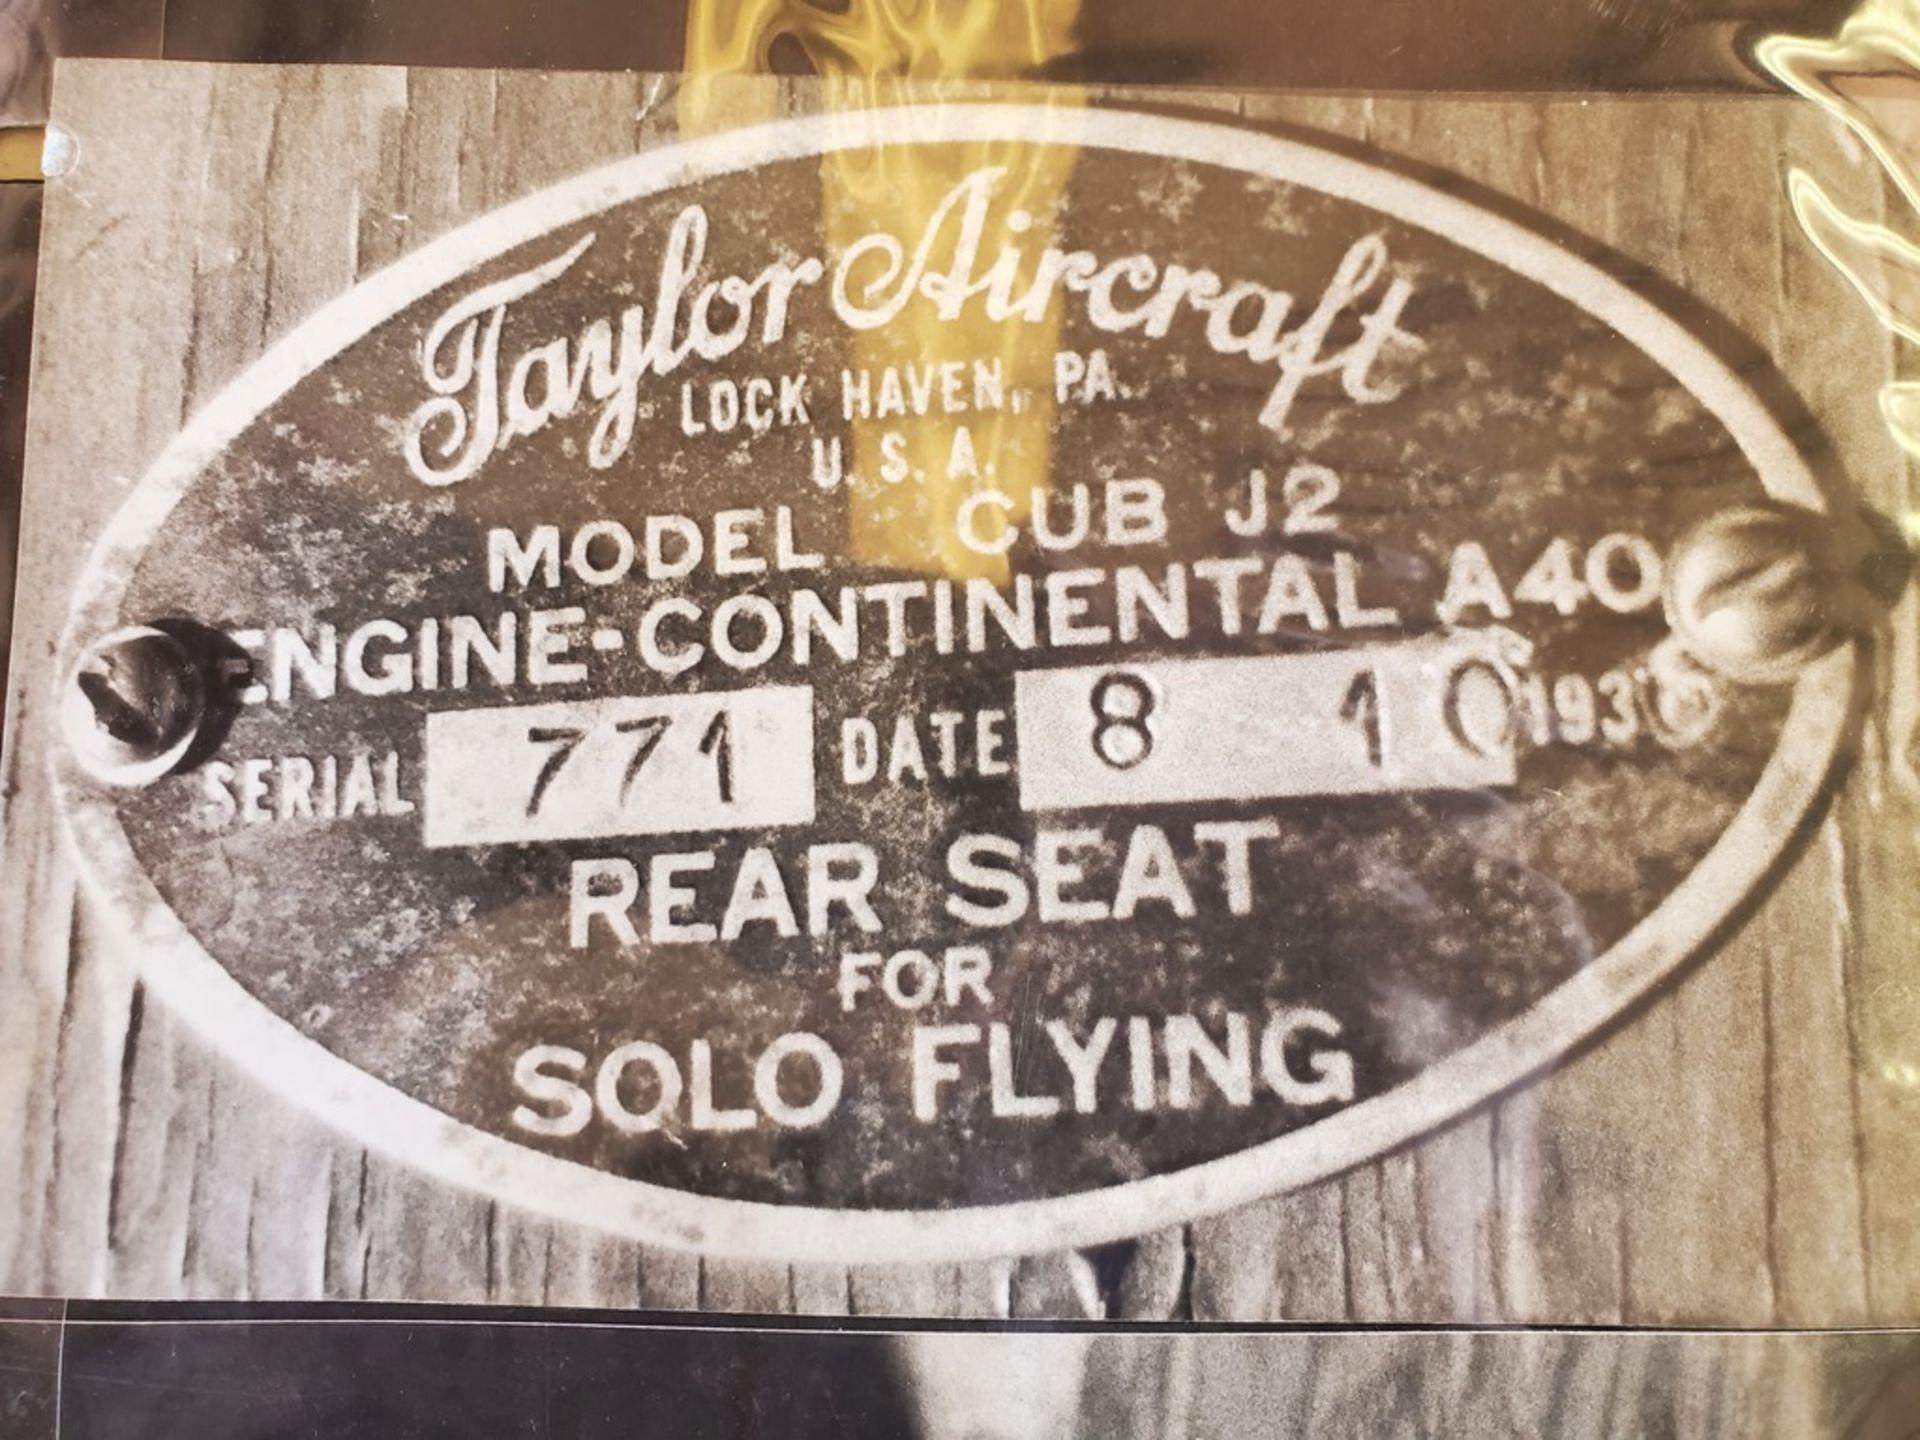 1936 TAYLOR/PIPER J2 CUB N16769 S/N 771 - Image 4 of 4